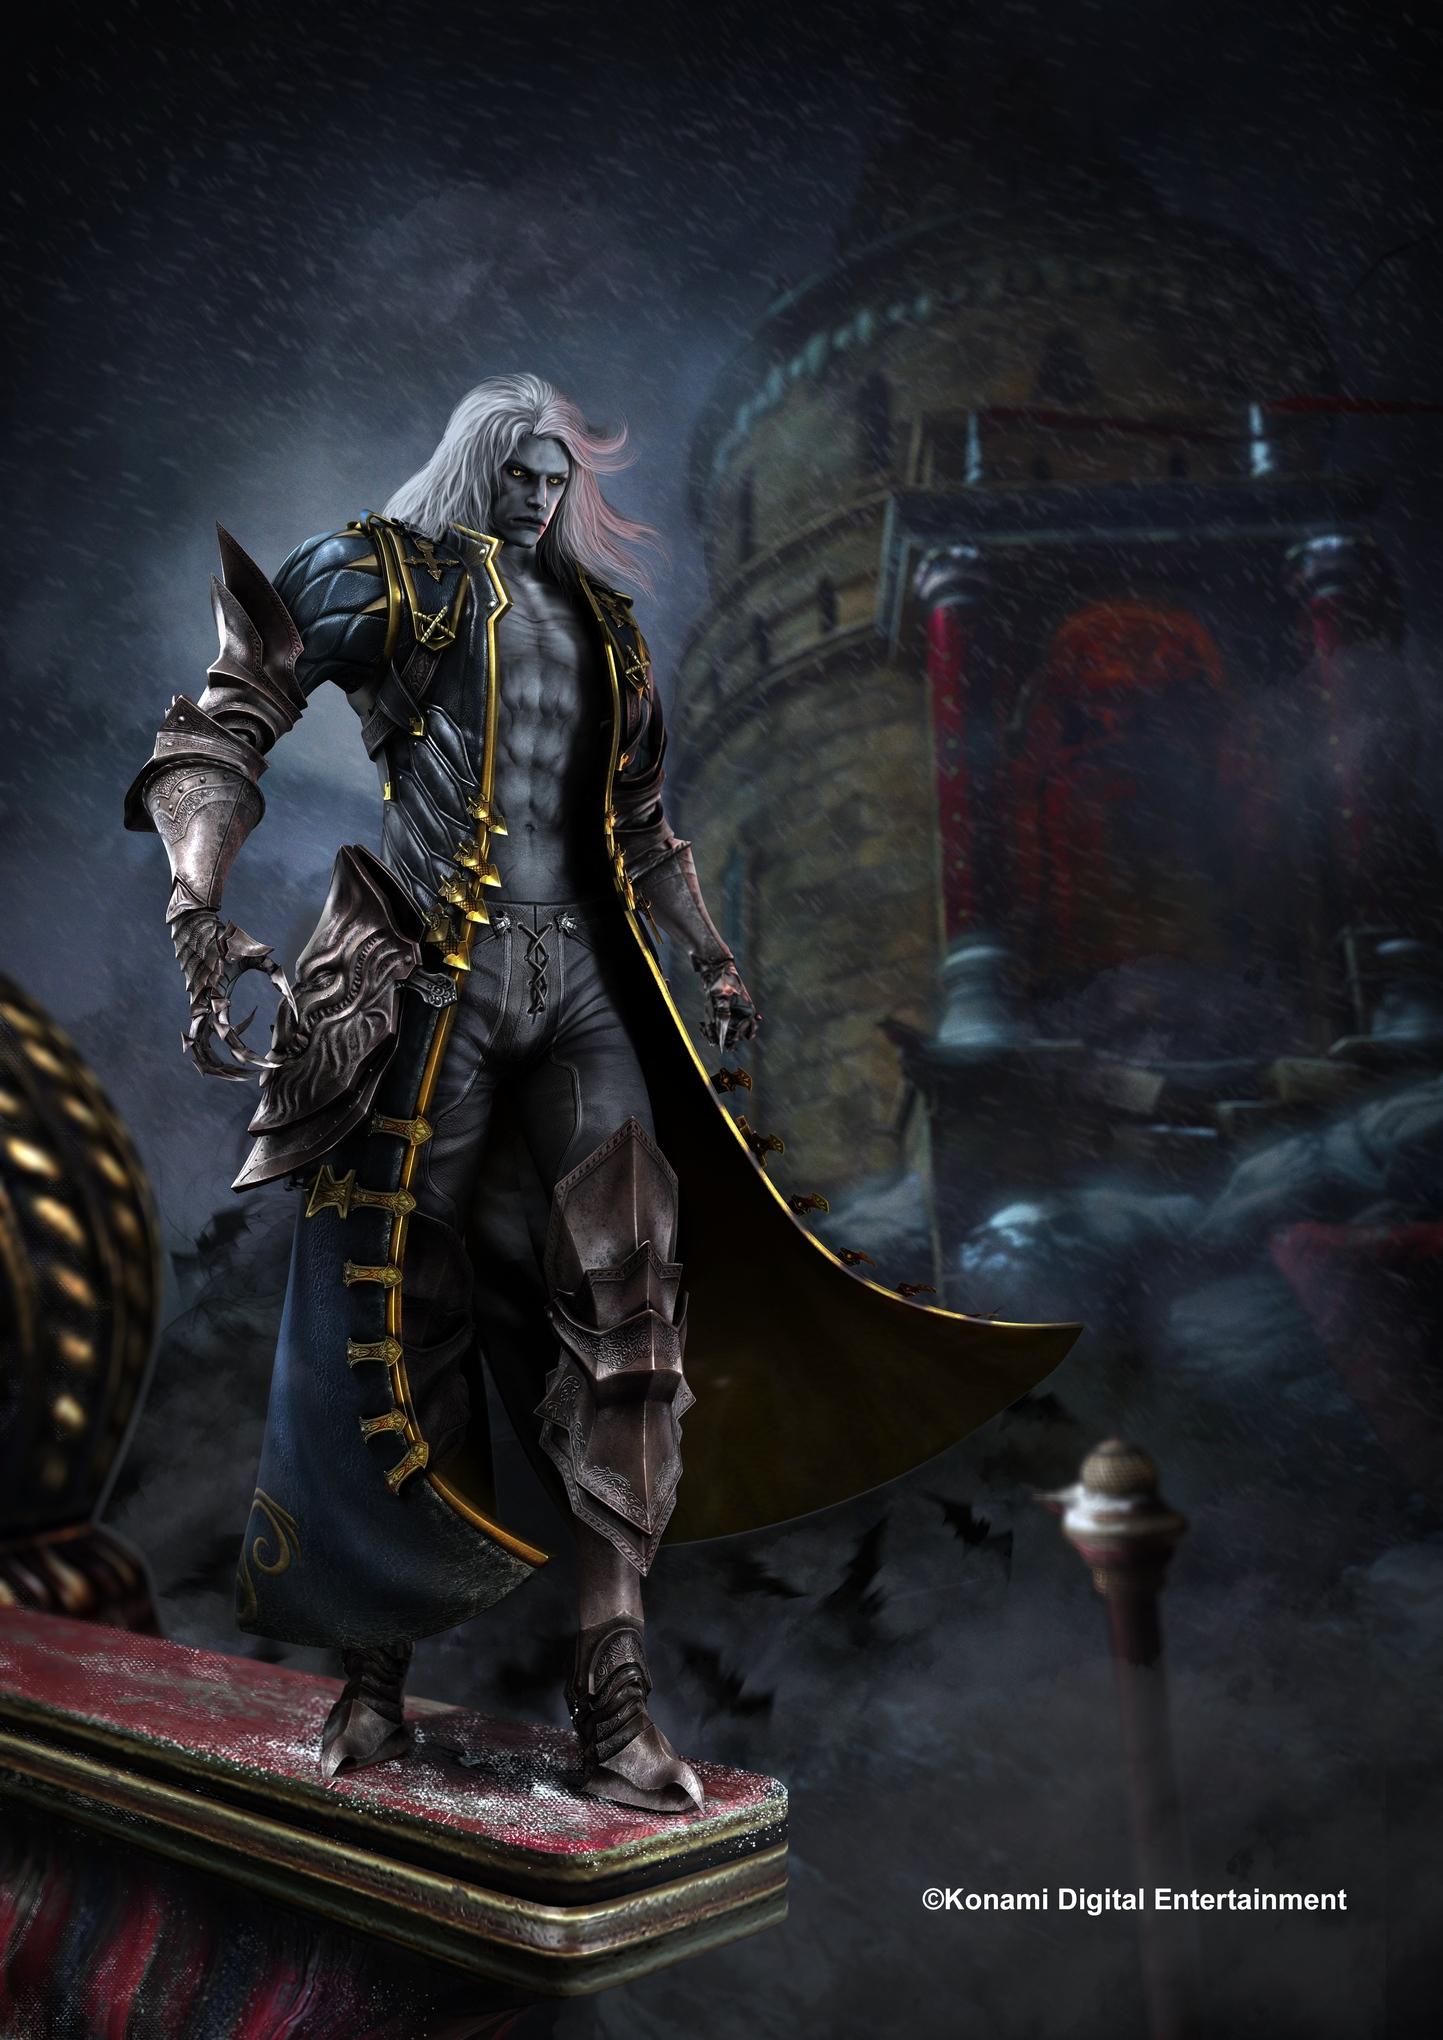 Castlevania: Lords of Shadow 2 Revelations DLC reintroduces Alucard March 25